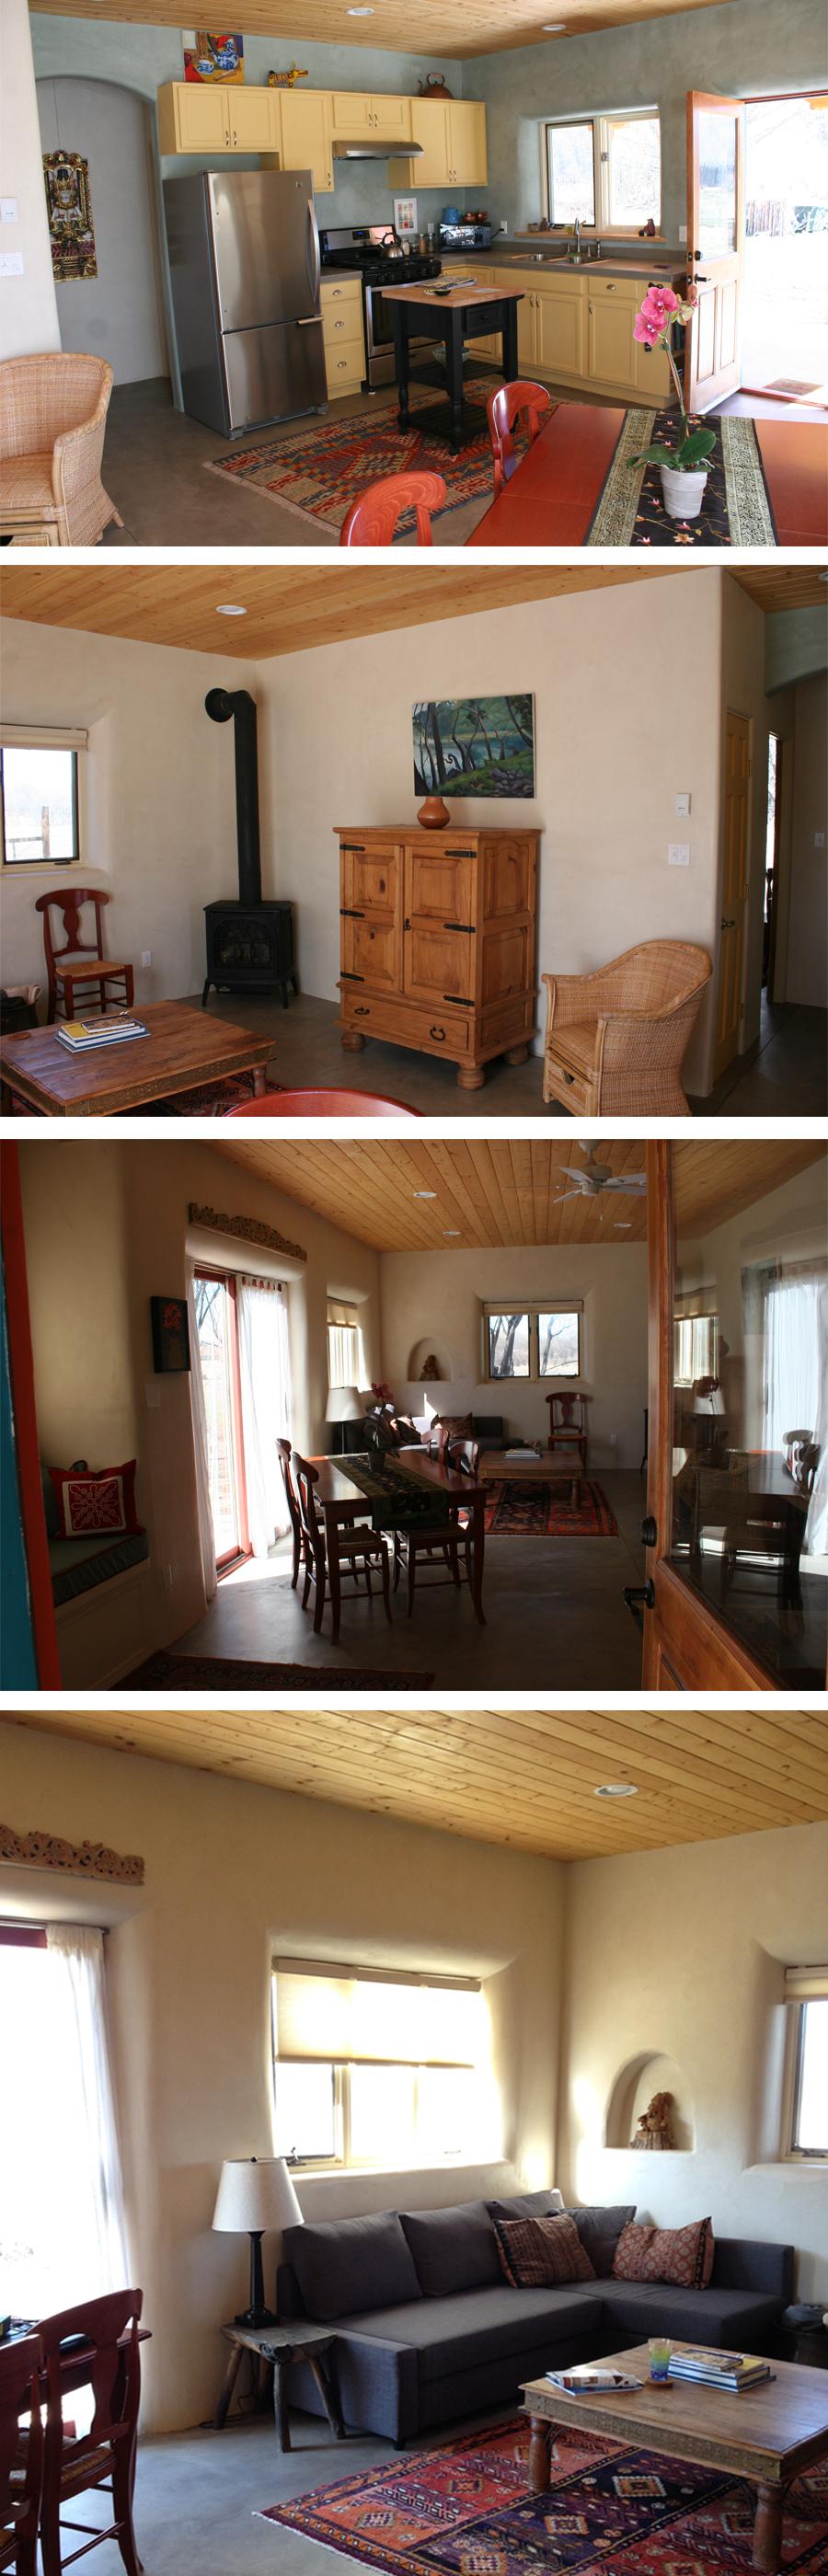 Airbnb NM inside